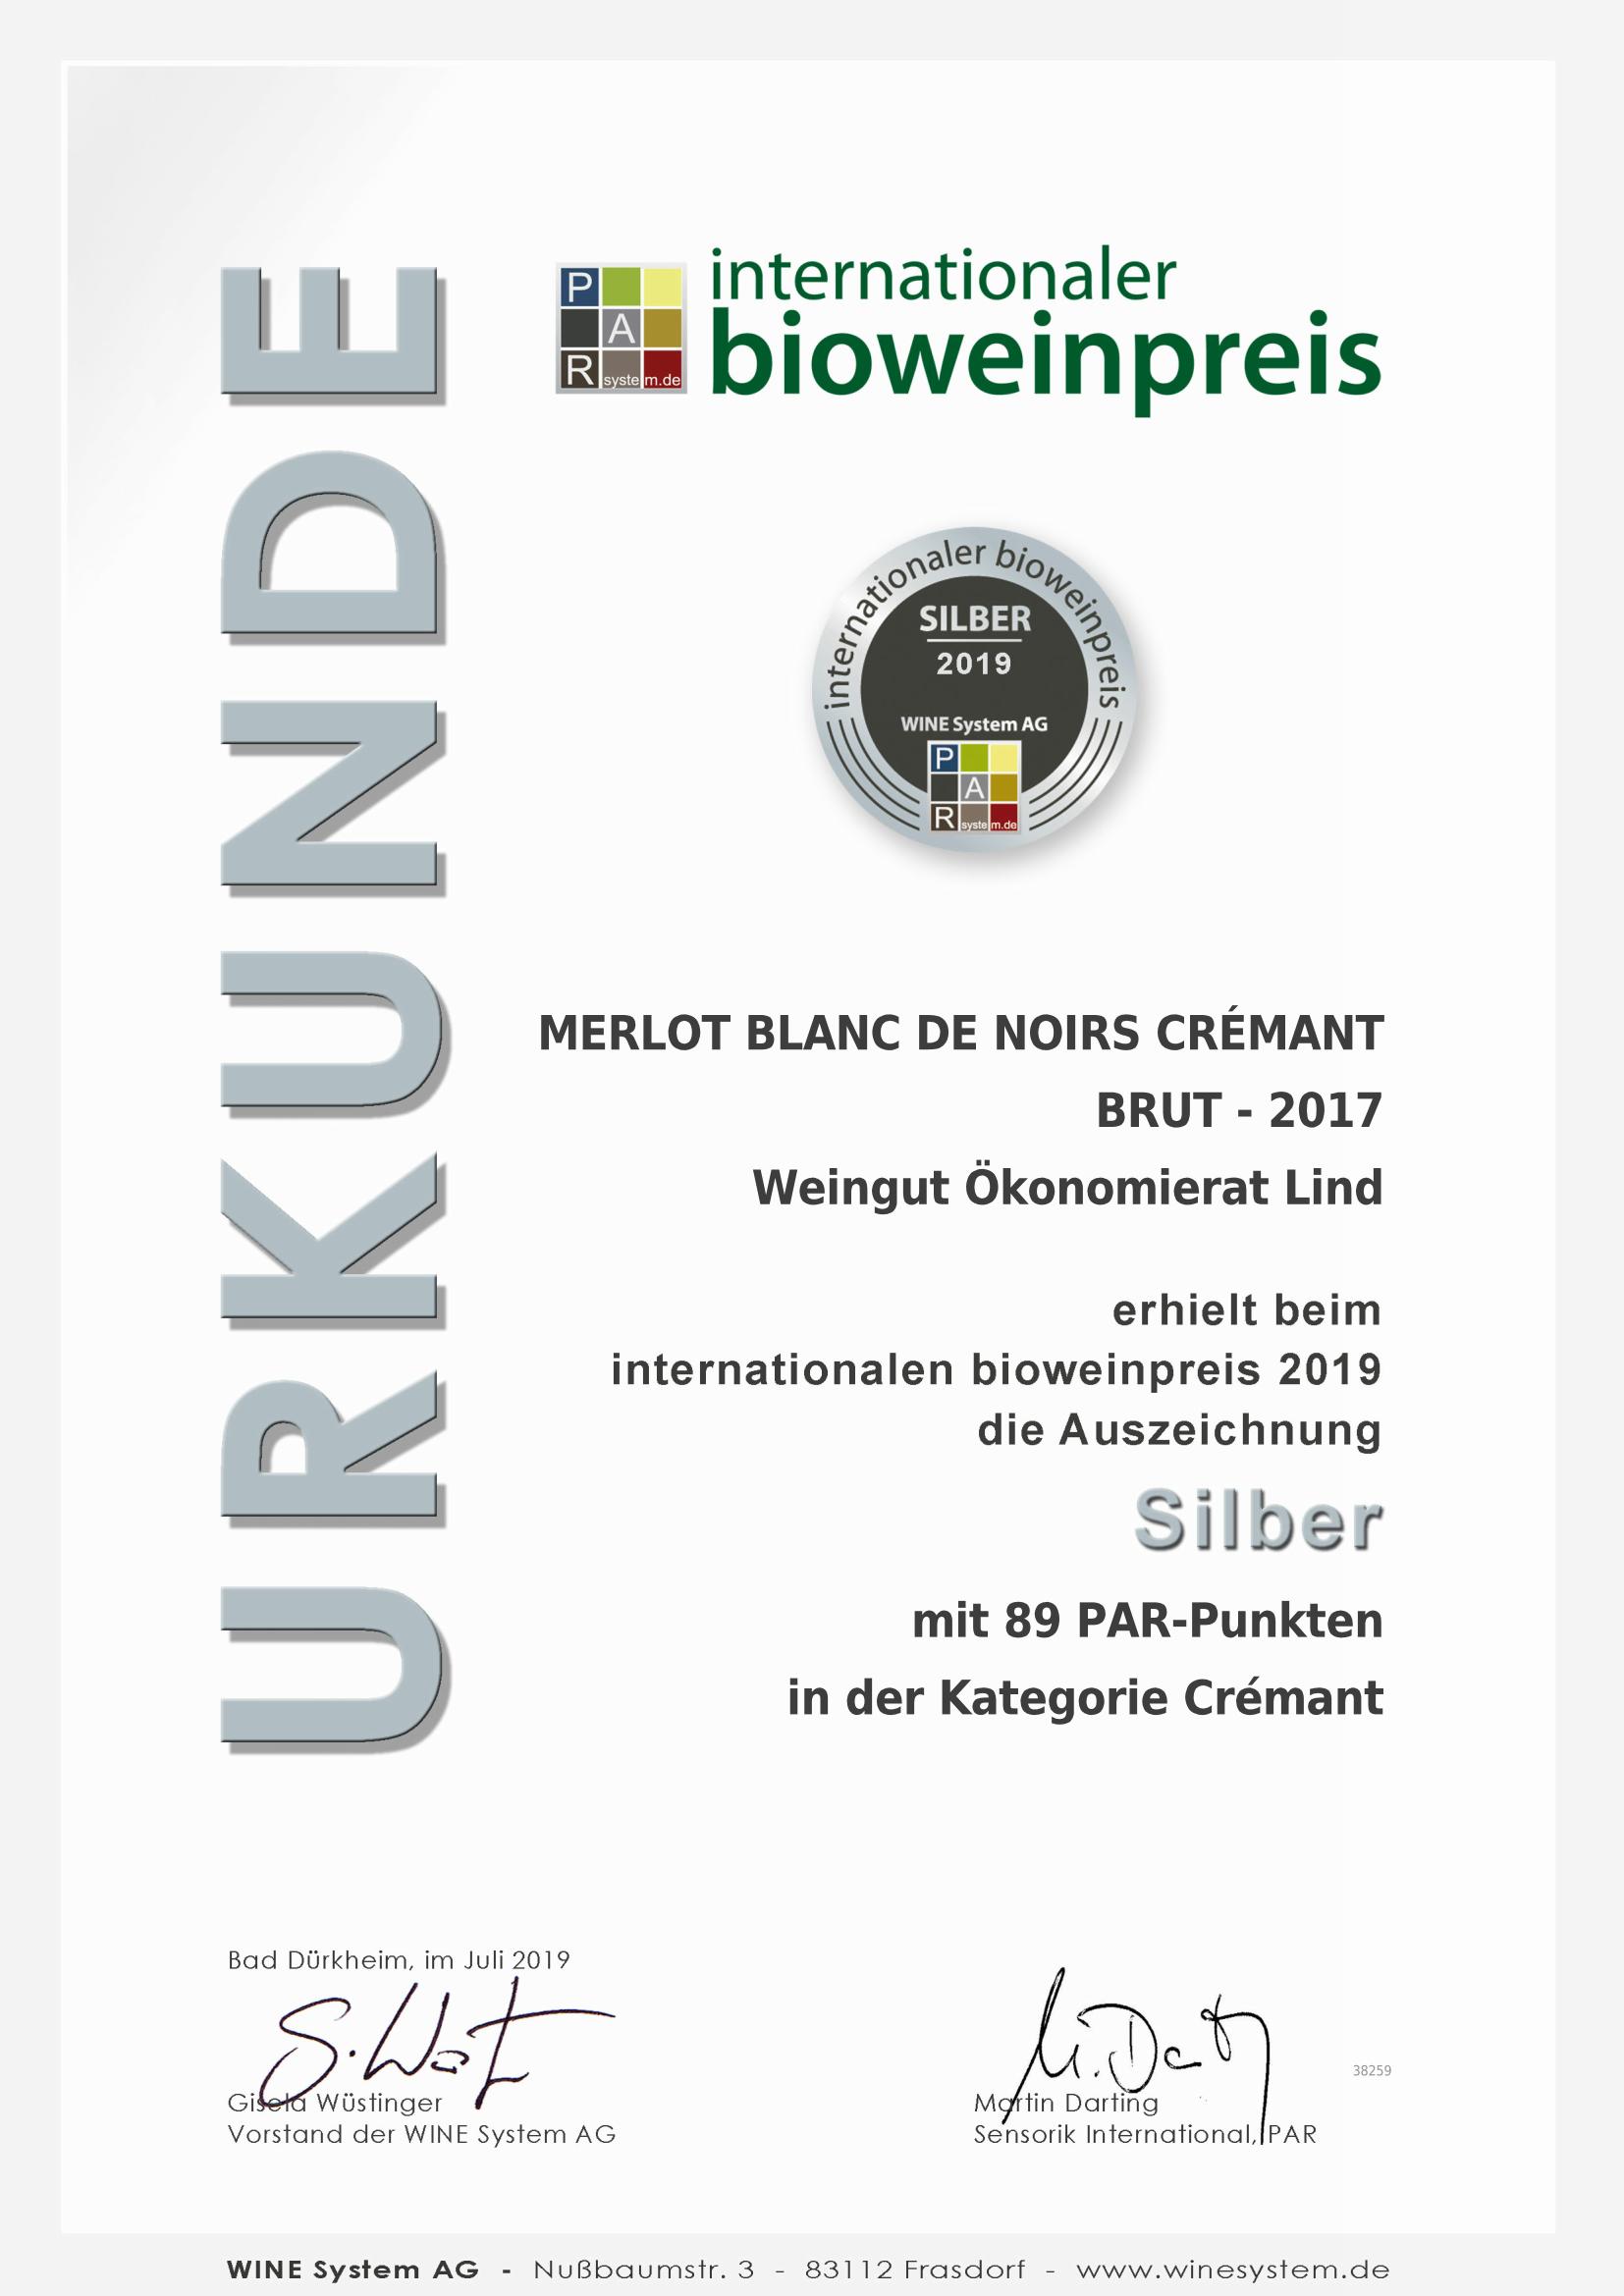 Internationaler Bioweinpreis Merlot Blanc de Noirs Crémant Brut 2017 - Silber